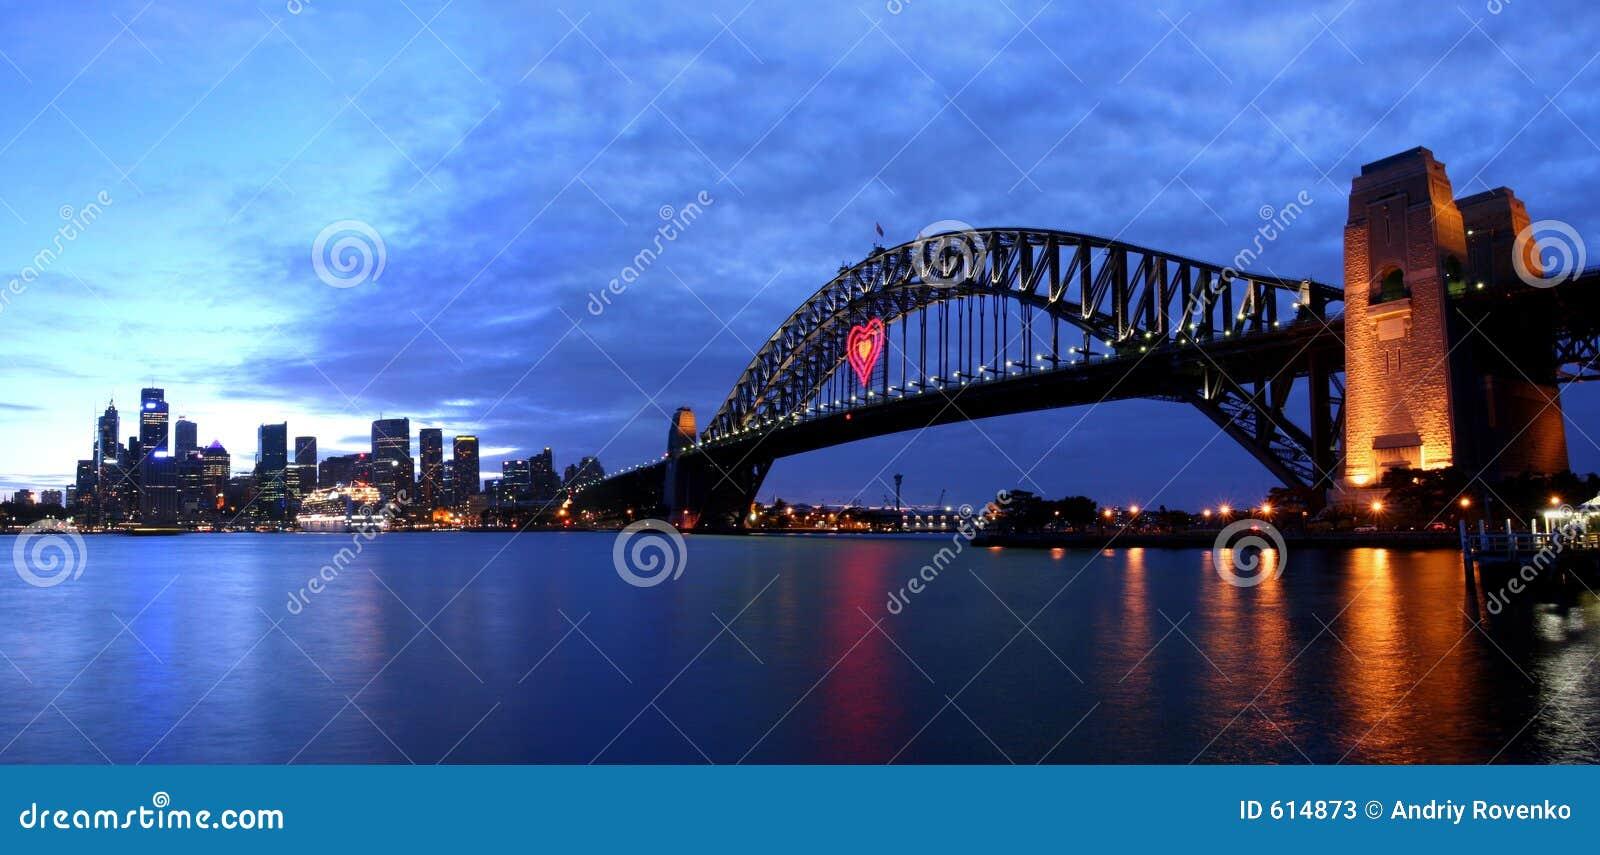 Sydney in Love